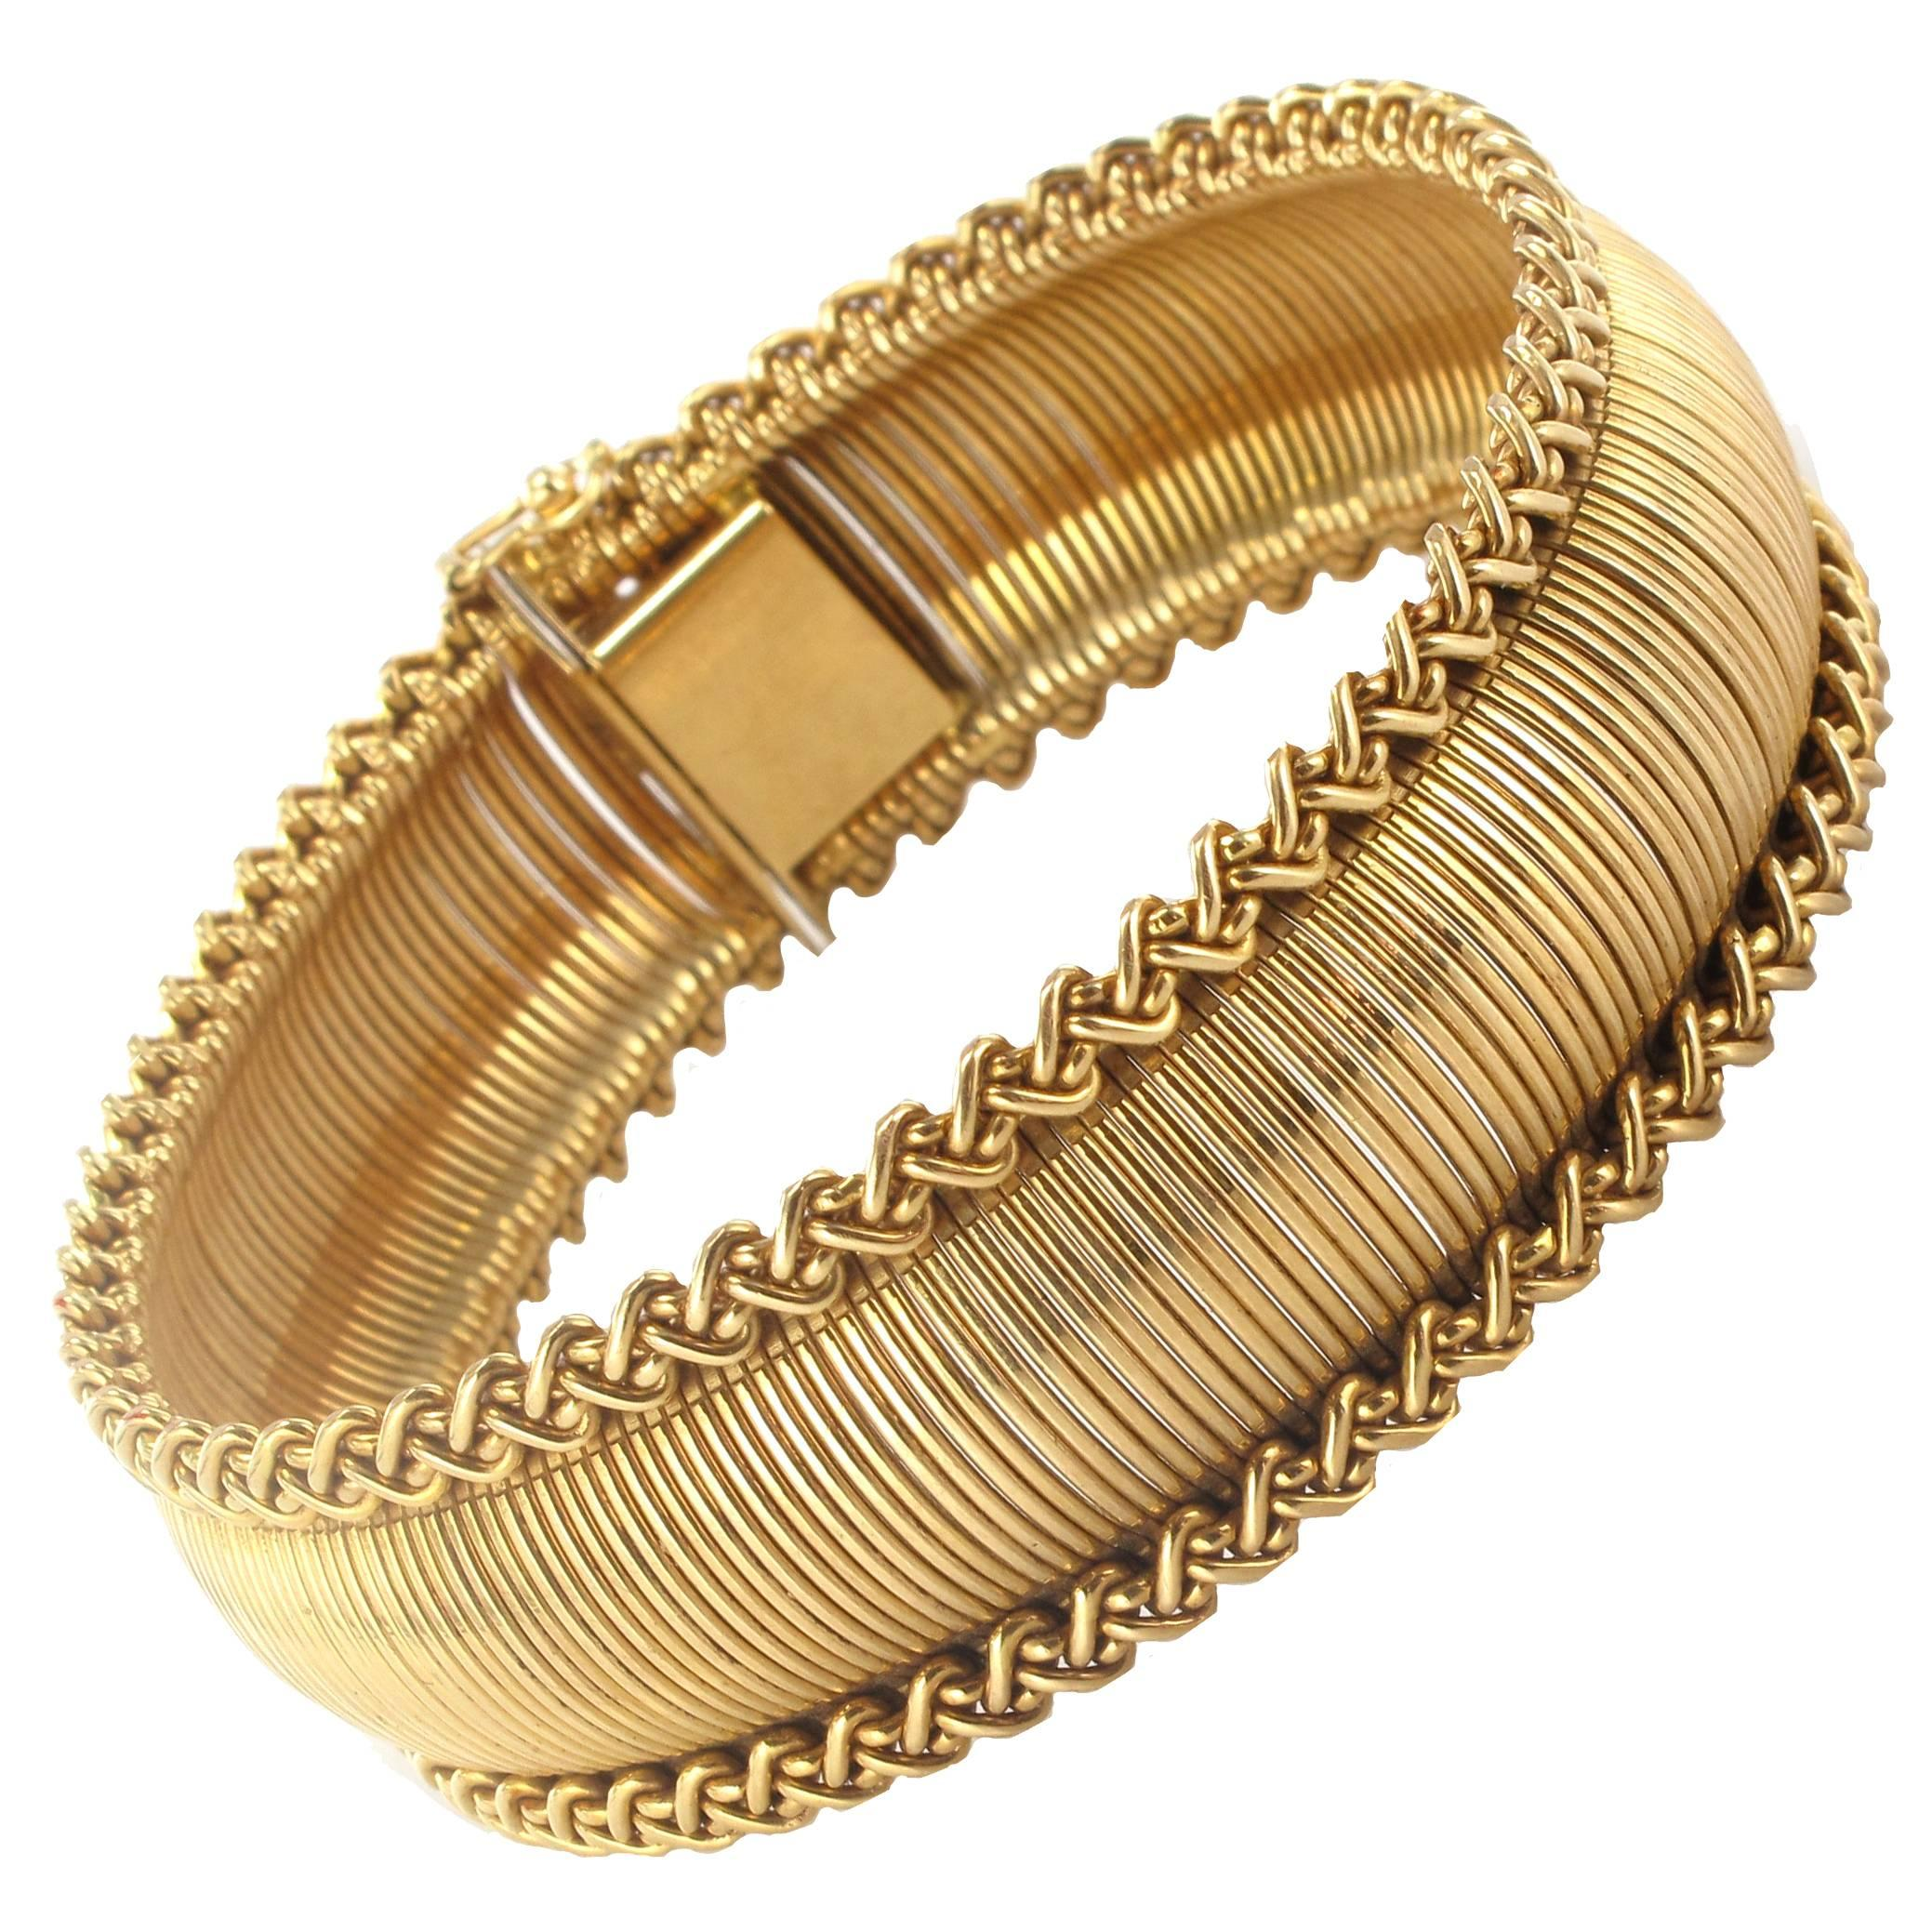 1950s French Gold Bracelet